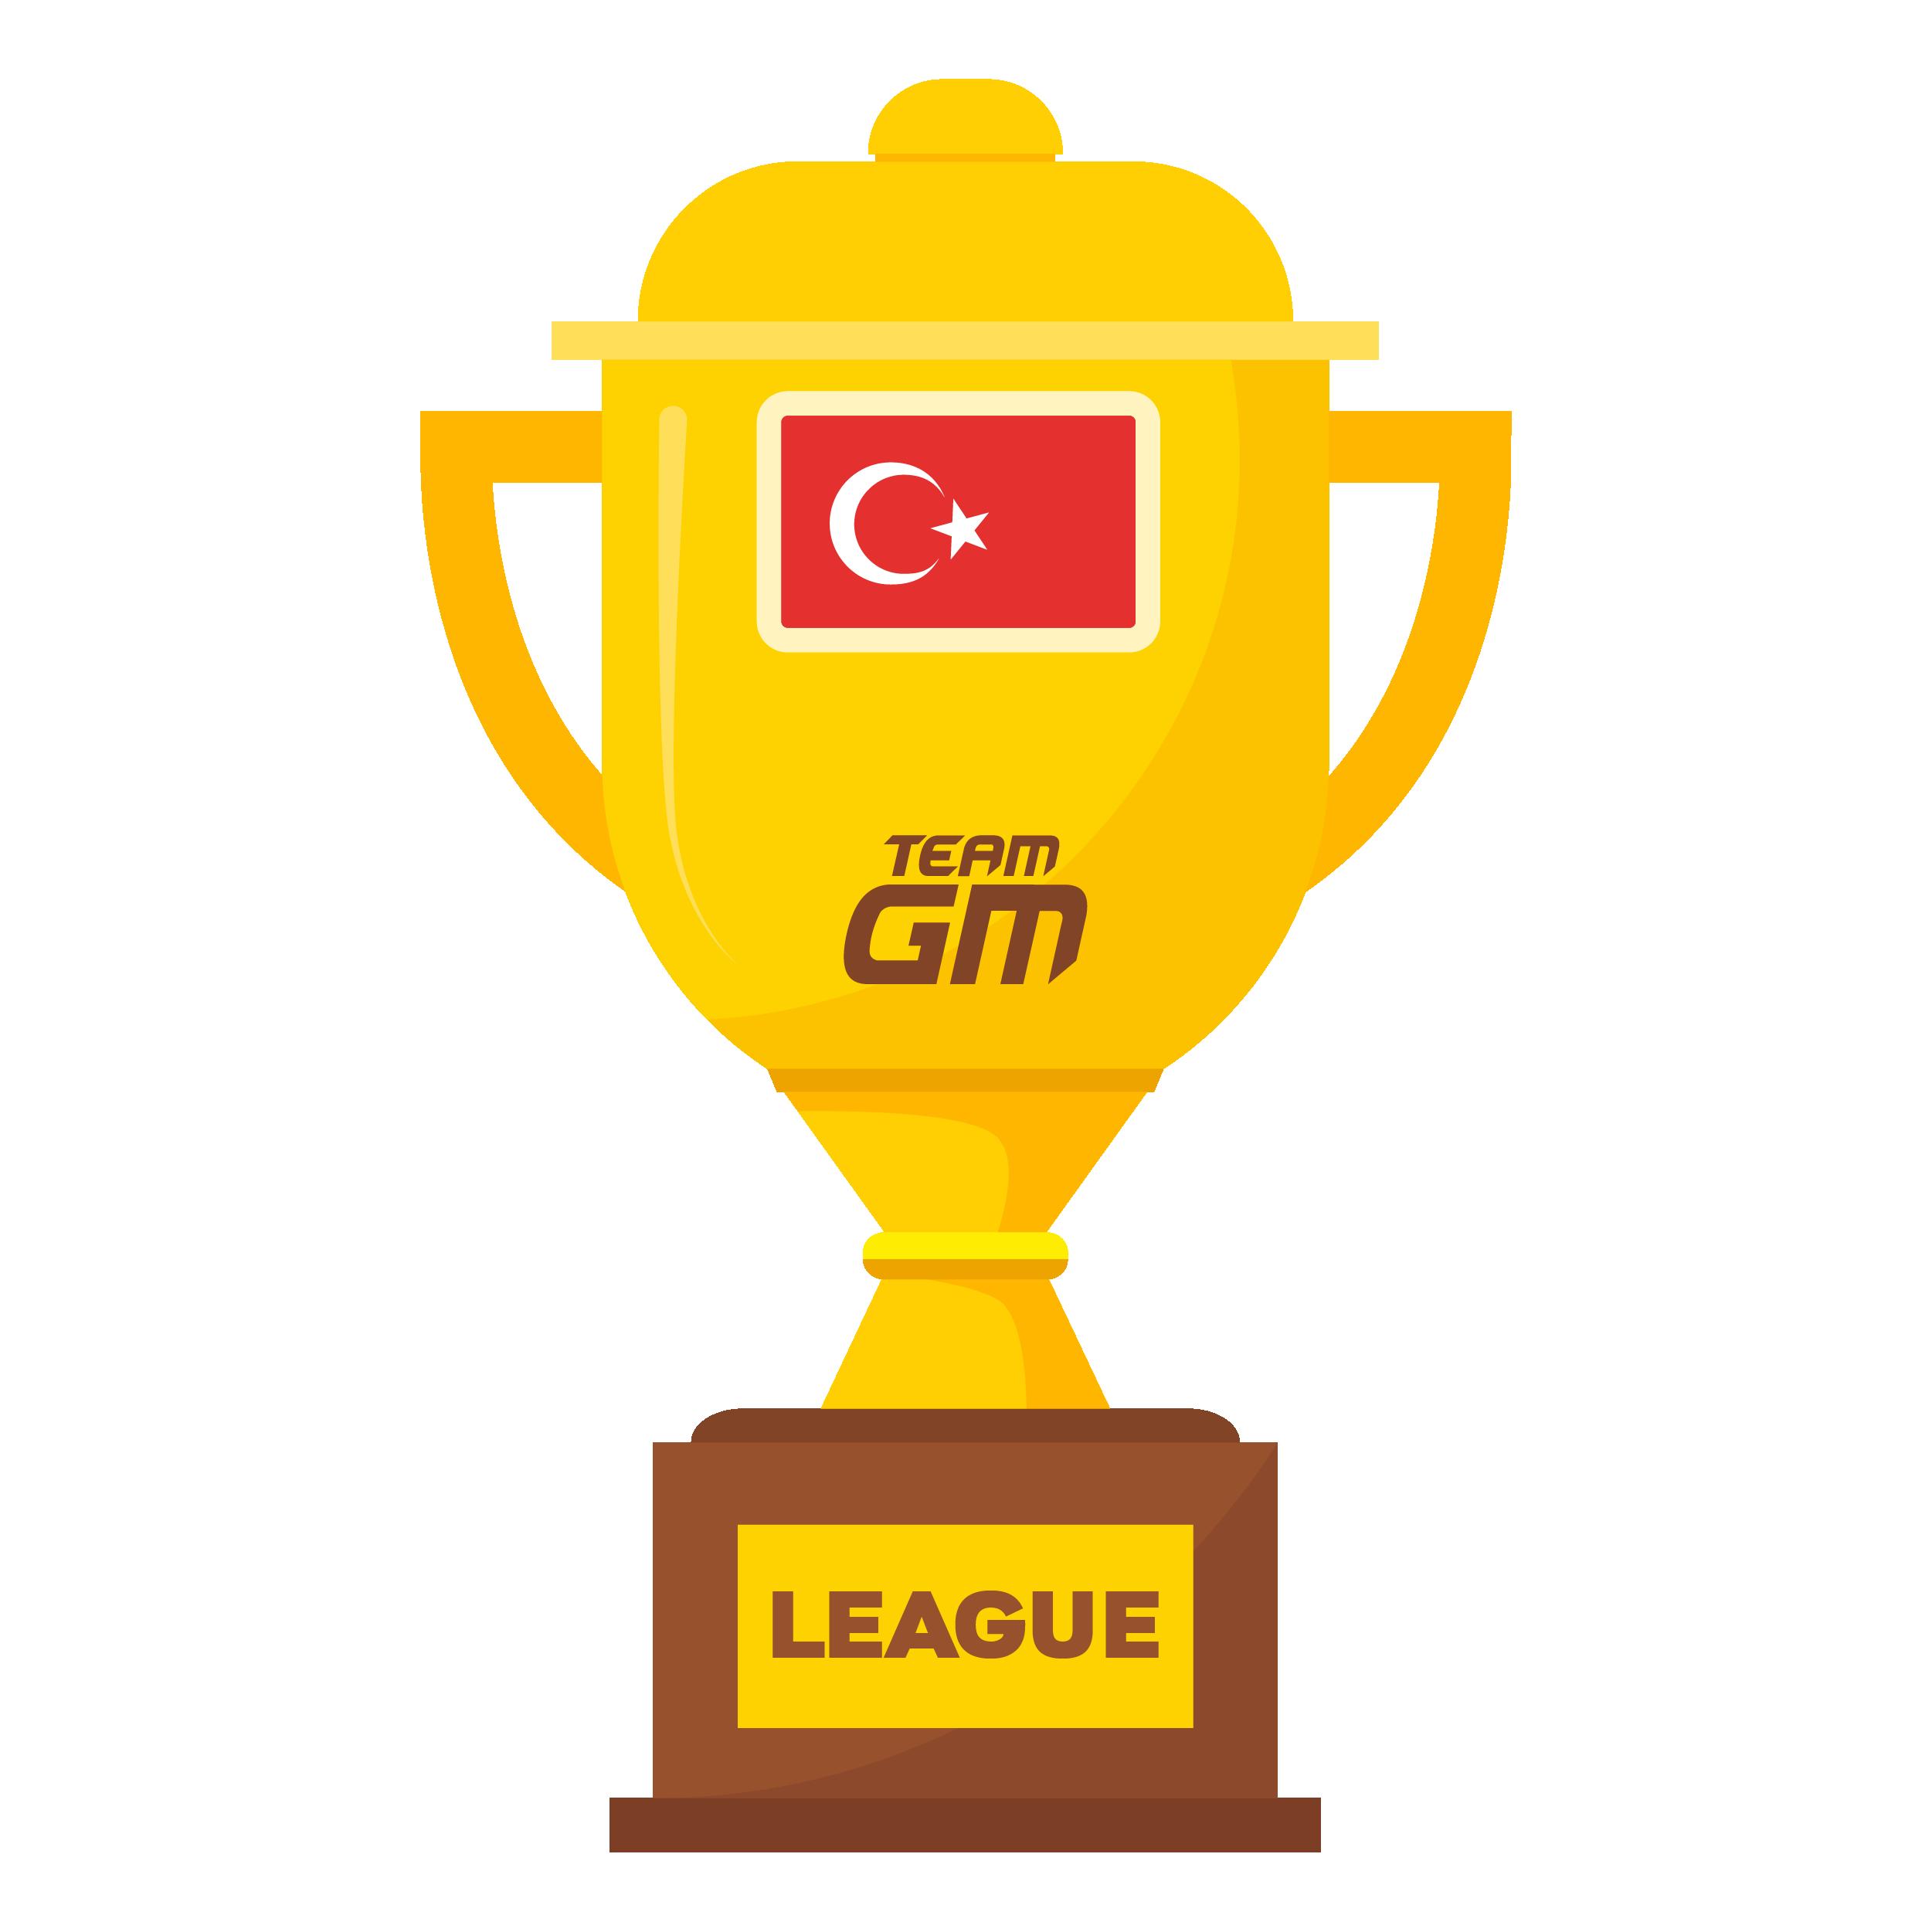 14TH - TURKISH LEAGUE